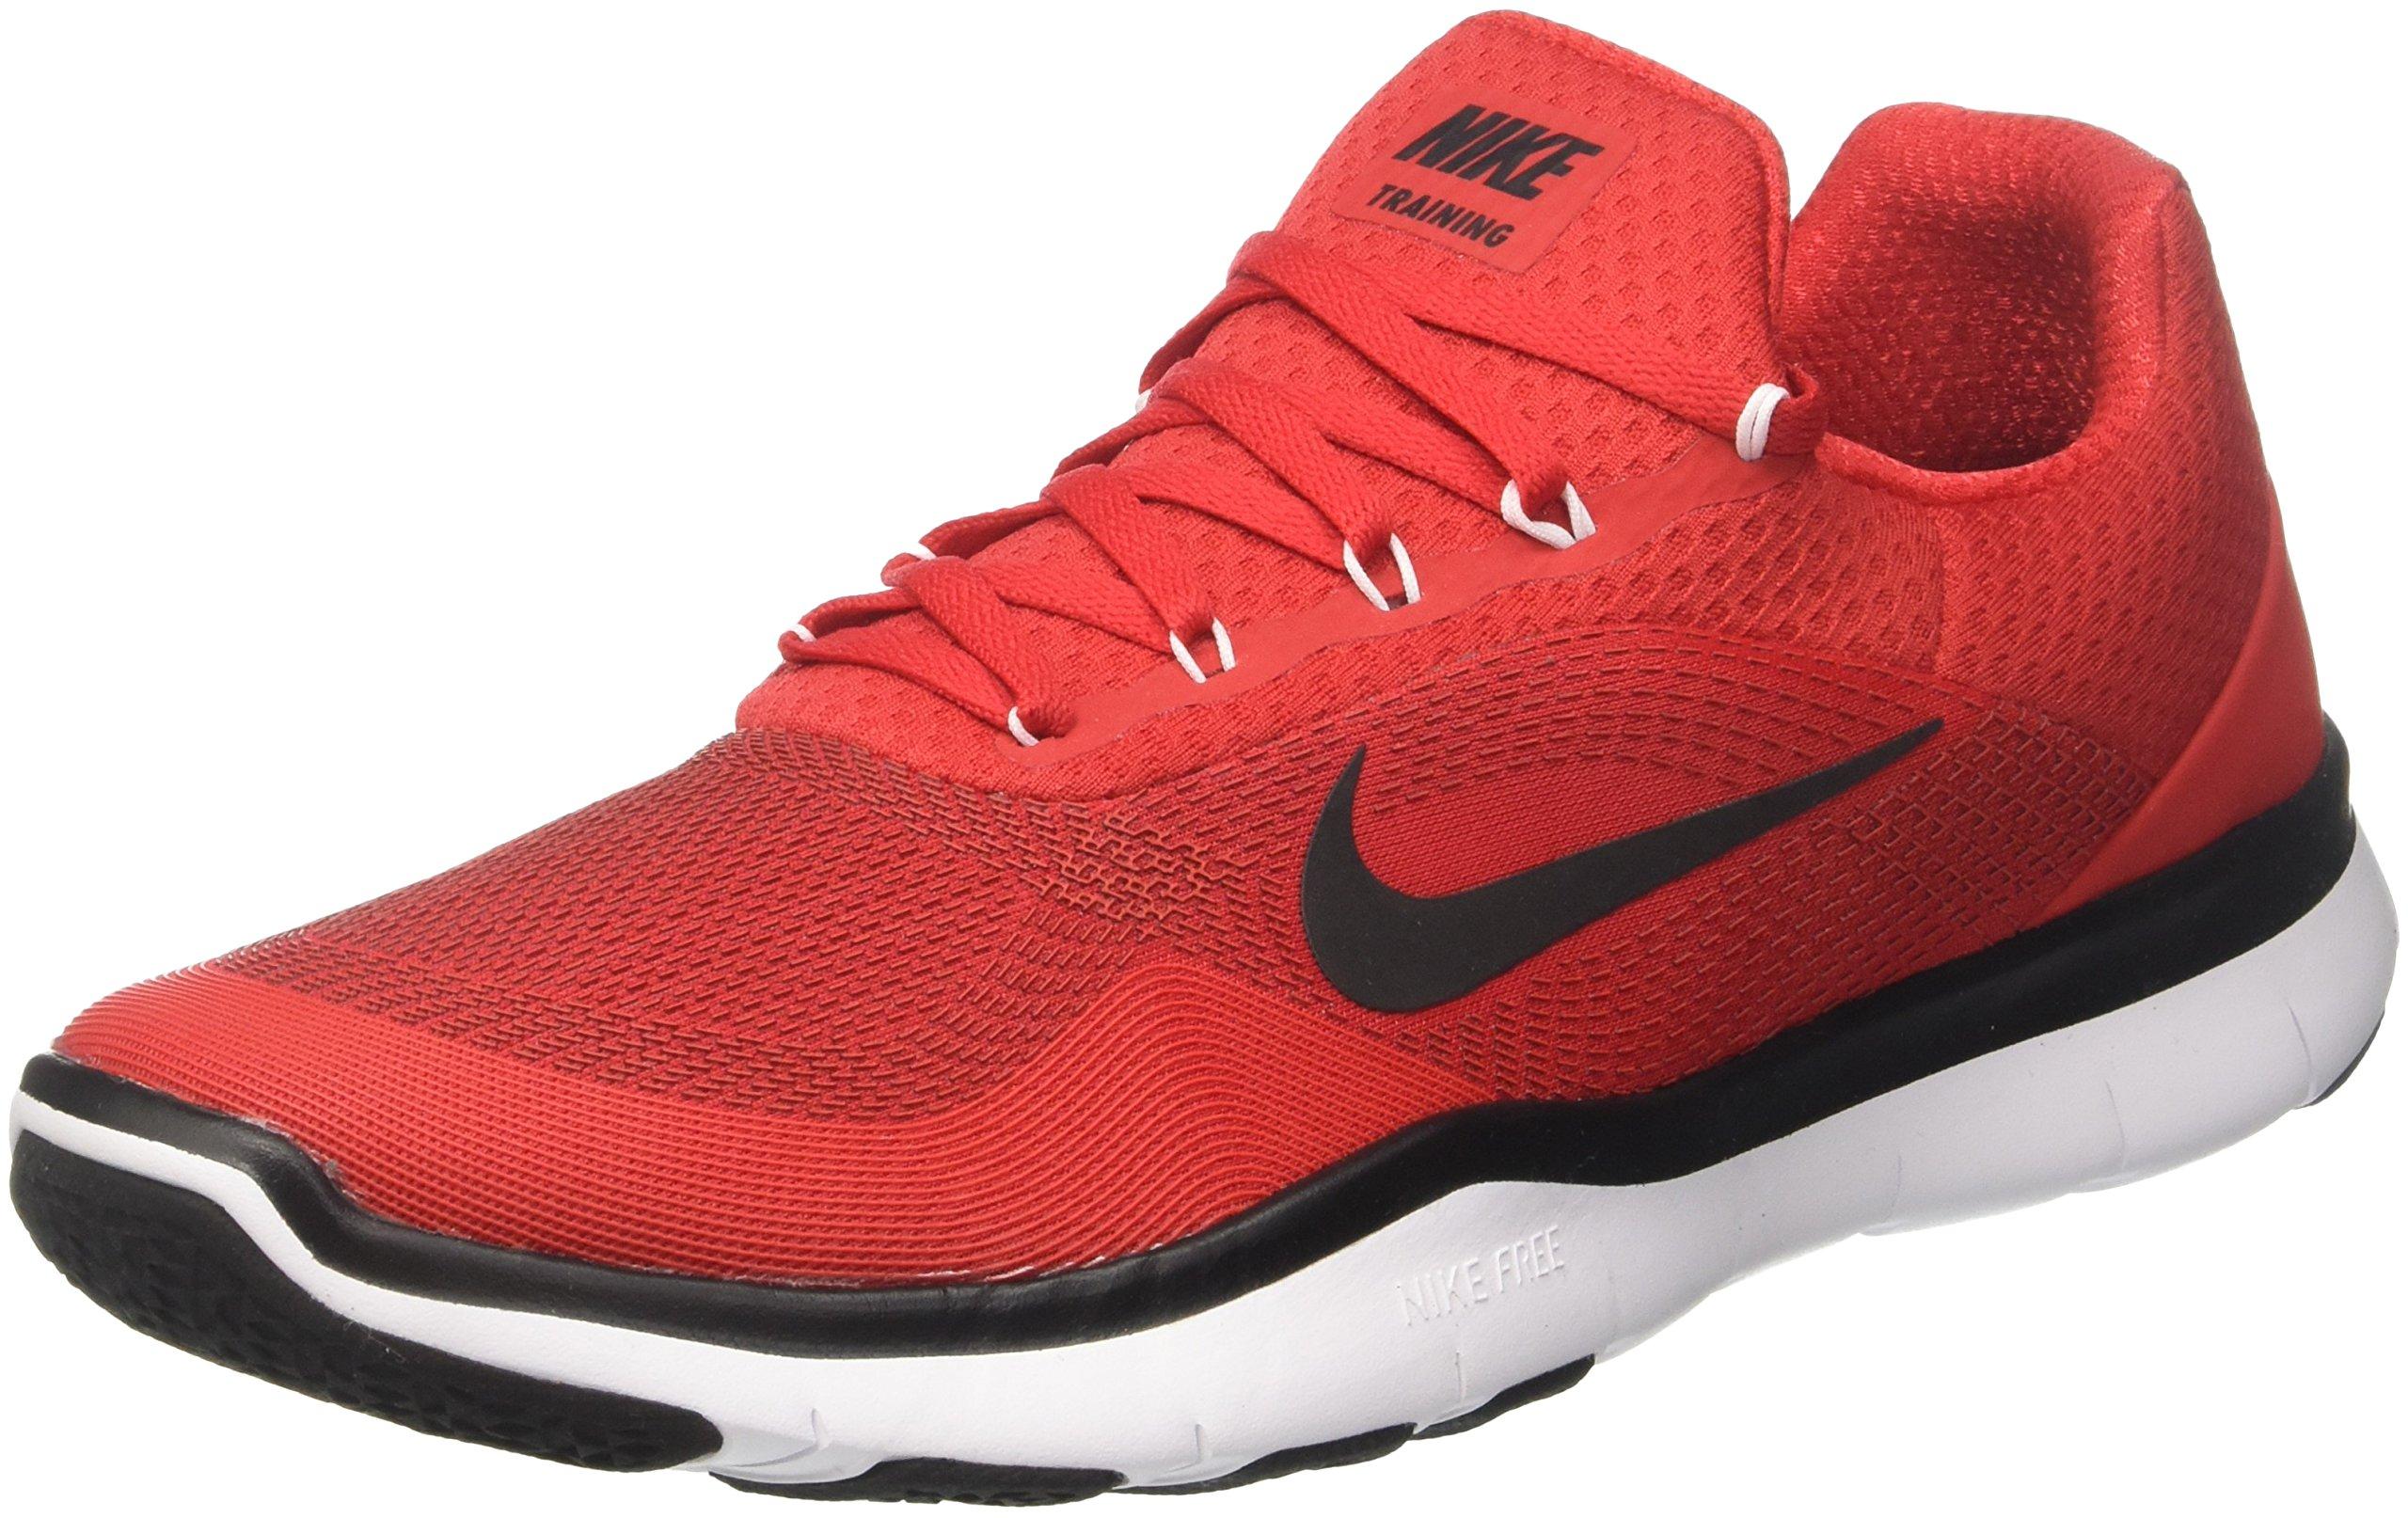 e2984247a8b5b Nike Men's Free Trainer v7 Training Shoes University Red/Black- White 10.5